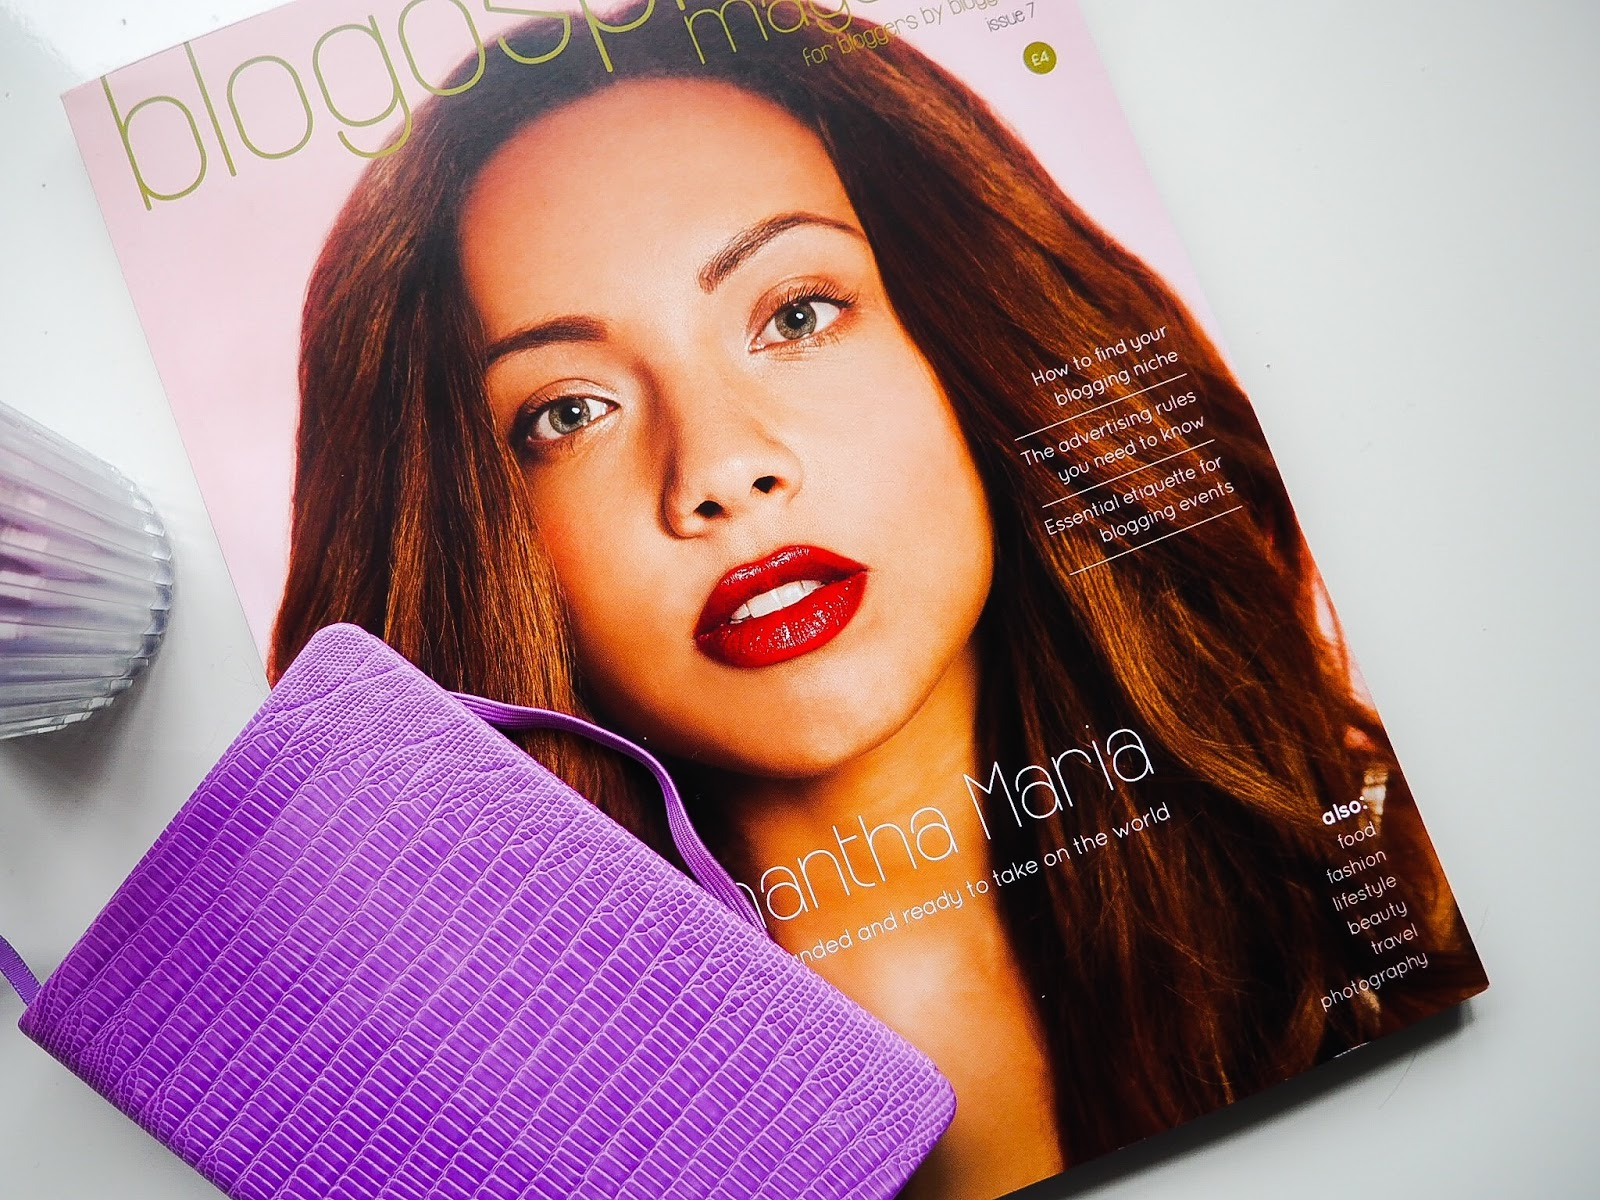 Blogosphere magazine issue 7 blog post samantha maria bloggers